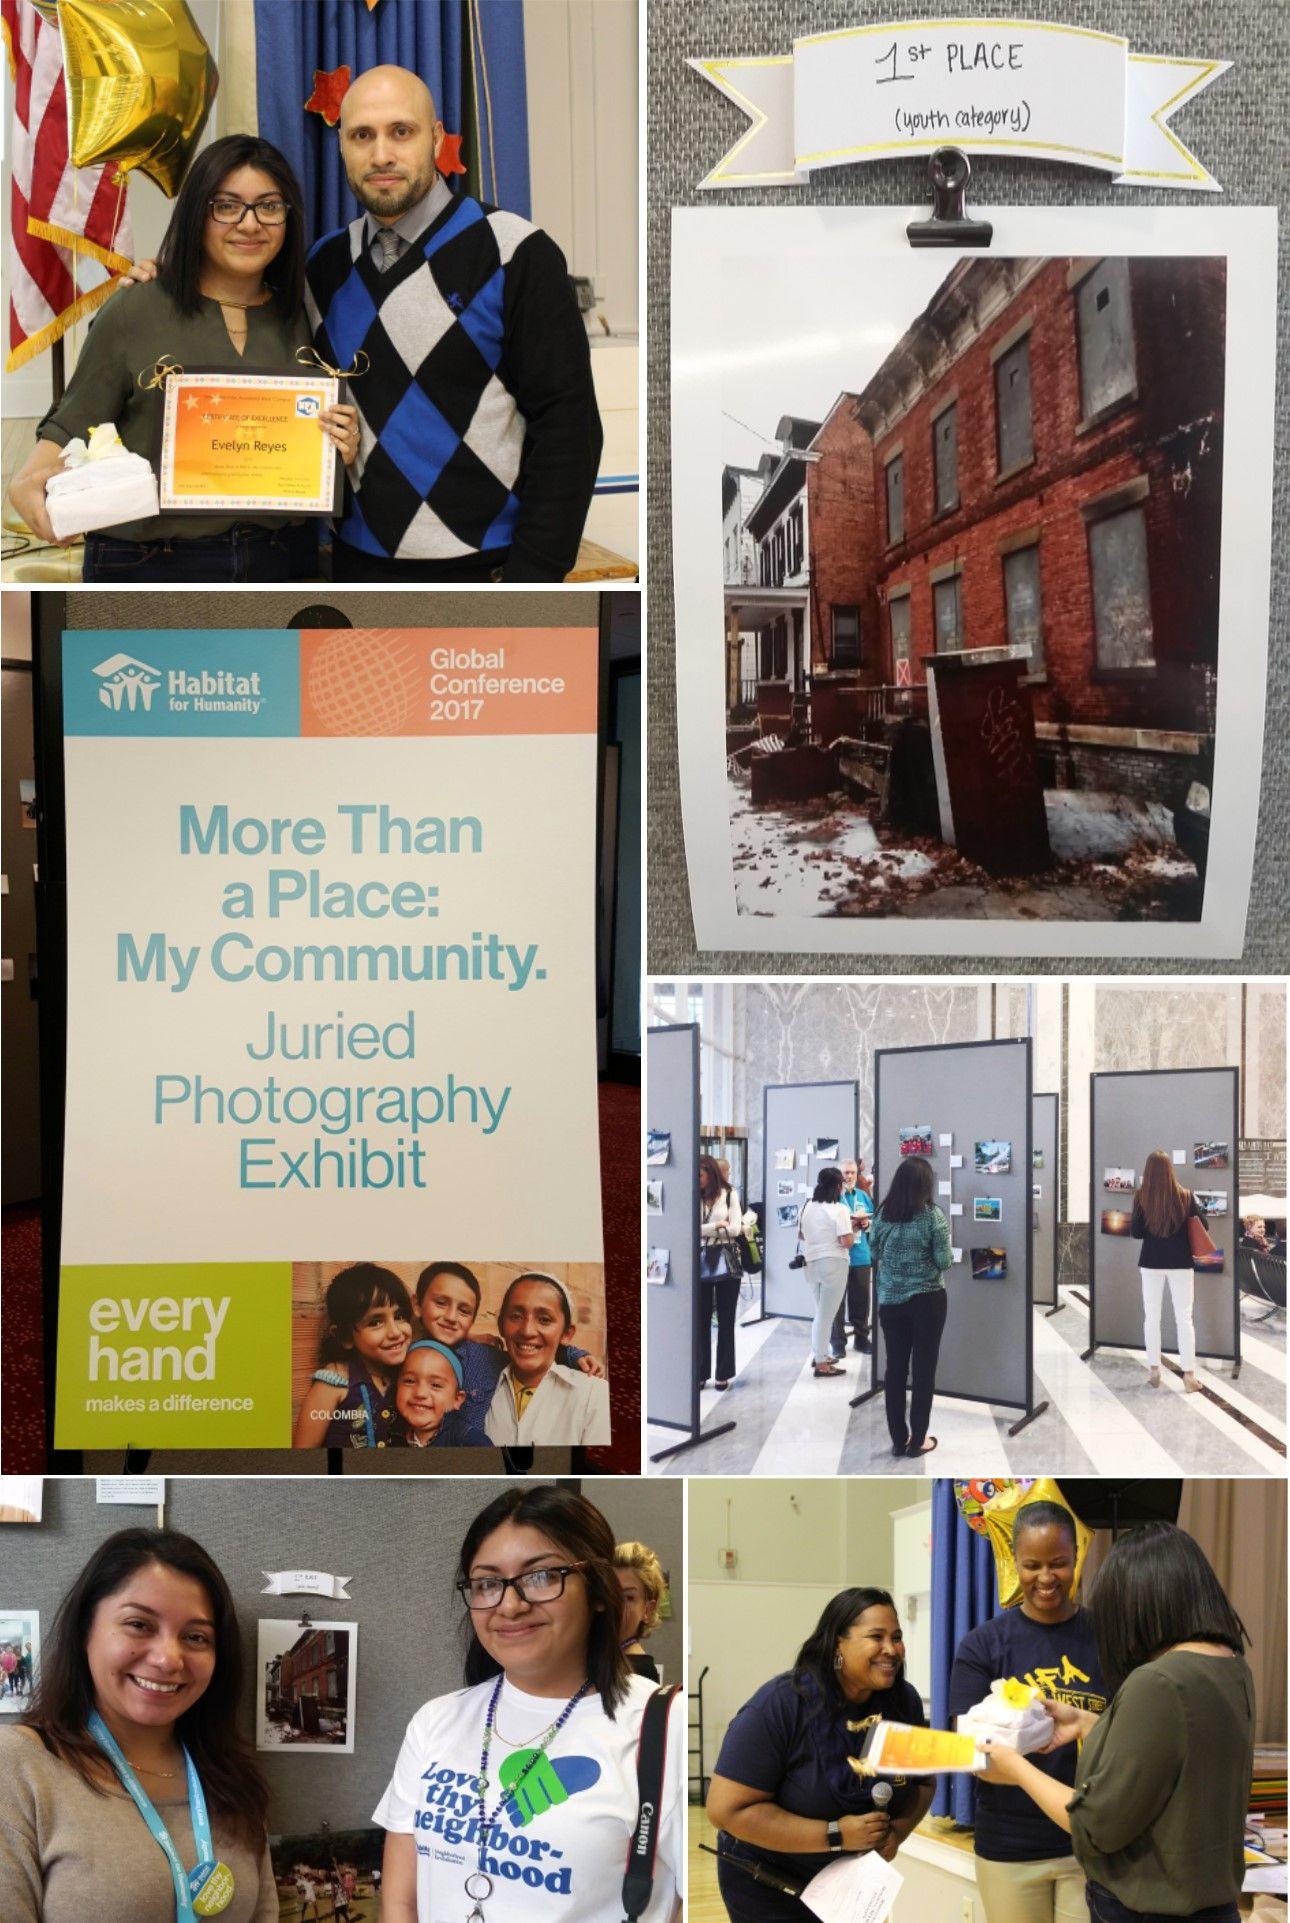 Neighborhood Revitalization SPOTLIGHT! Evelyn Reyes